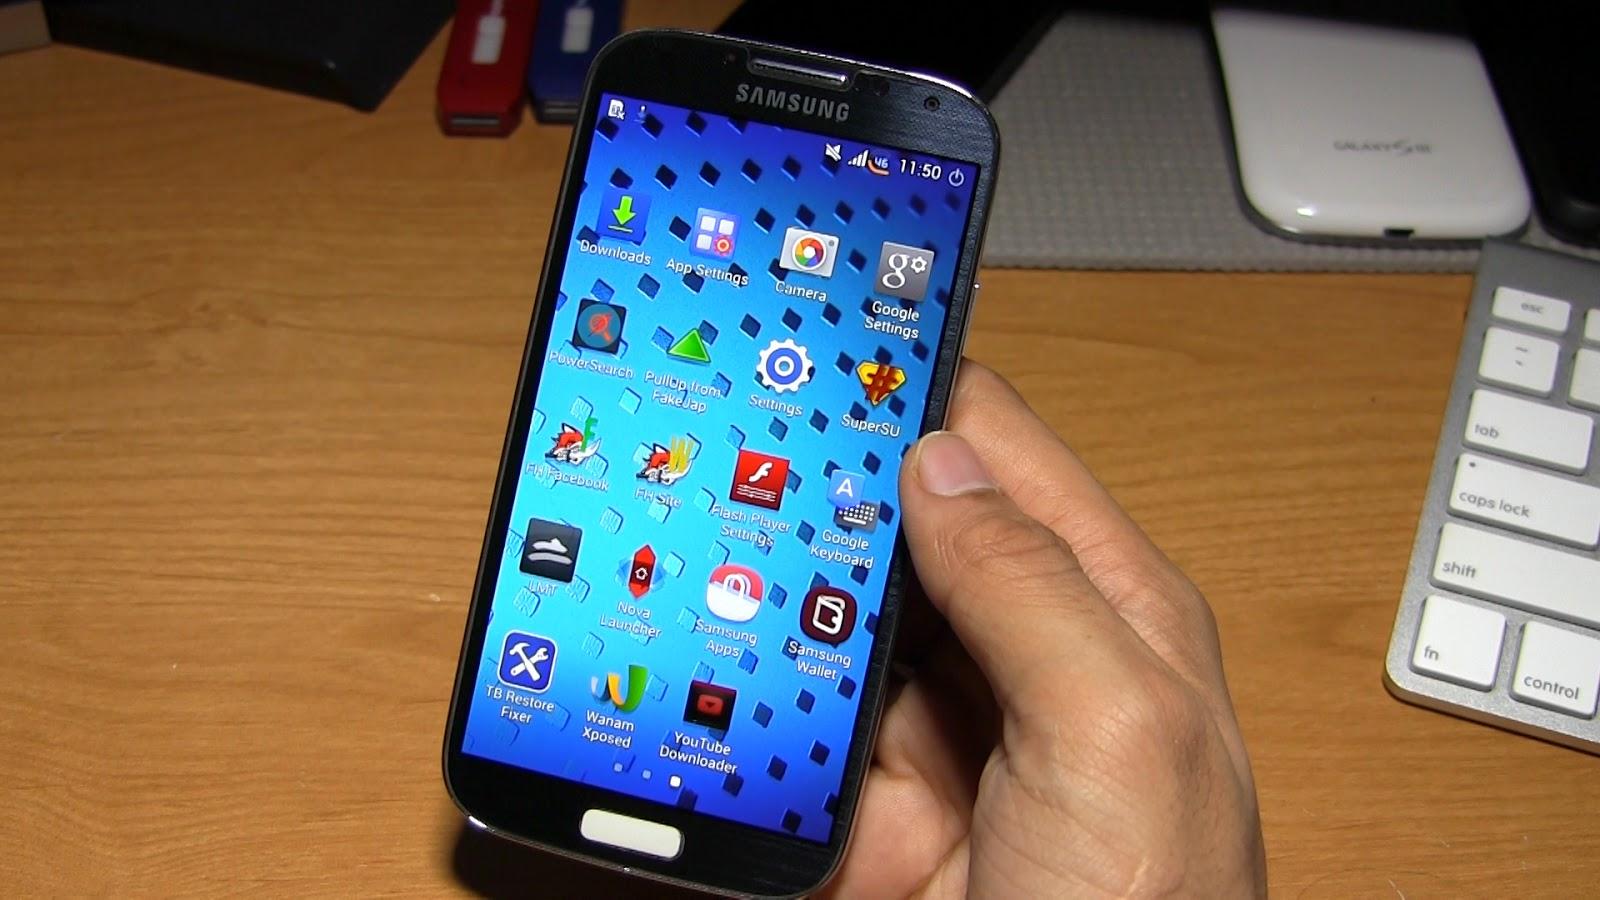 Galaxy s5 Rom zip